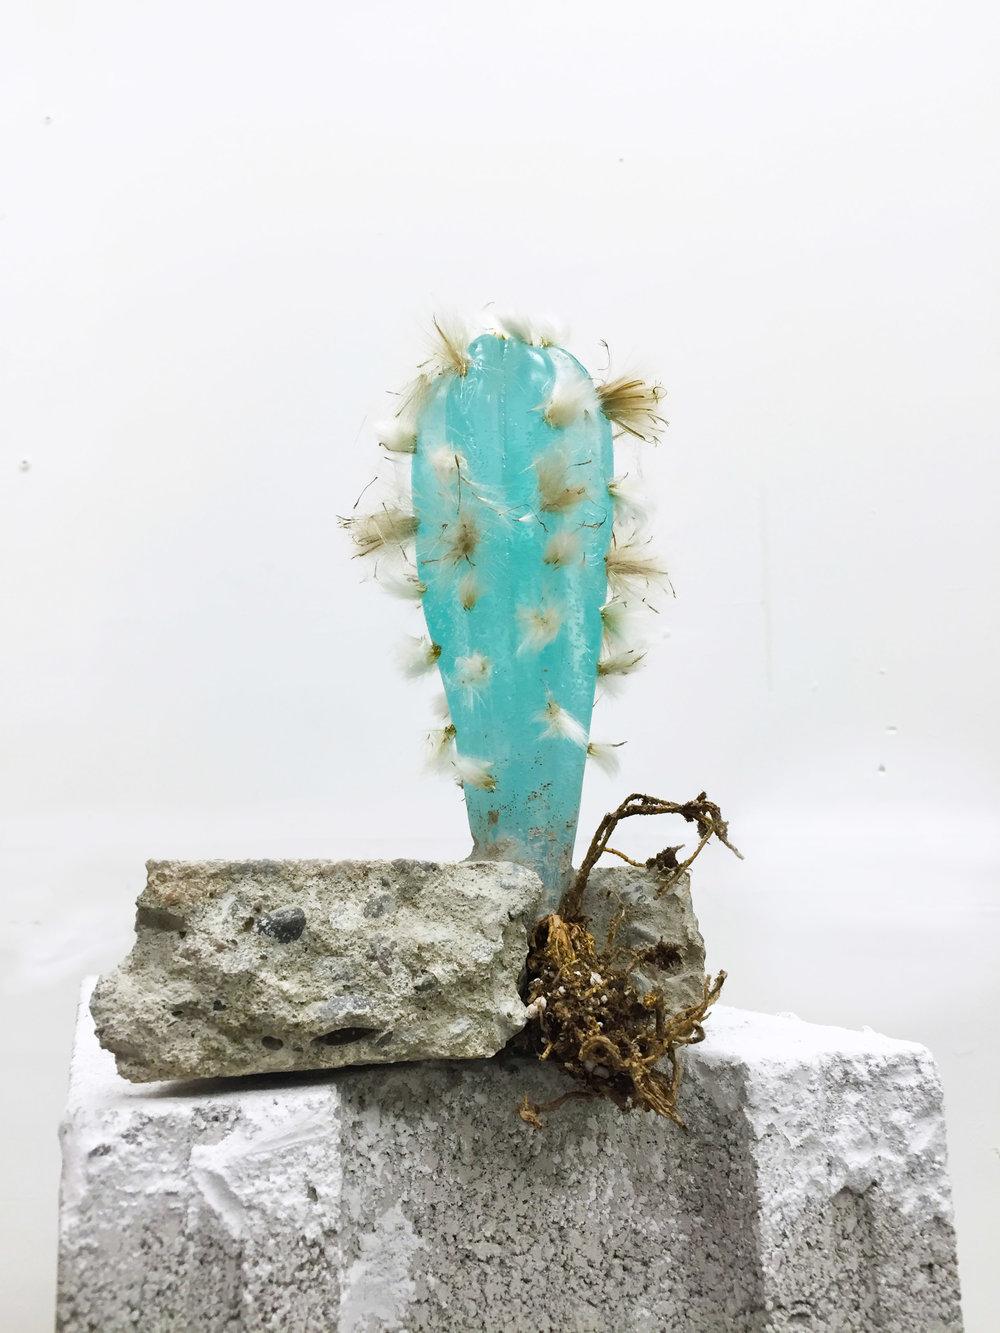 "Tau Lewis, Untitled Plant 3, polyurethane, concrete, cactus root, hawkweed seeds, chalk pastel, 6"" x 5"" x 4"", 2016"